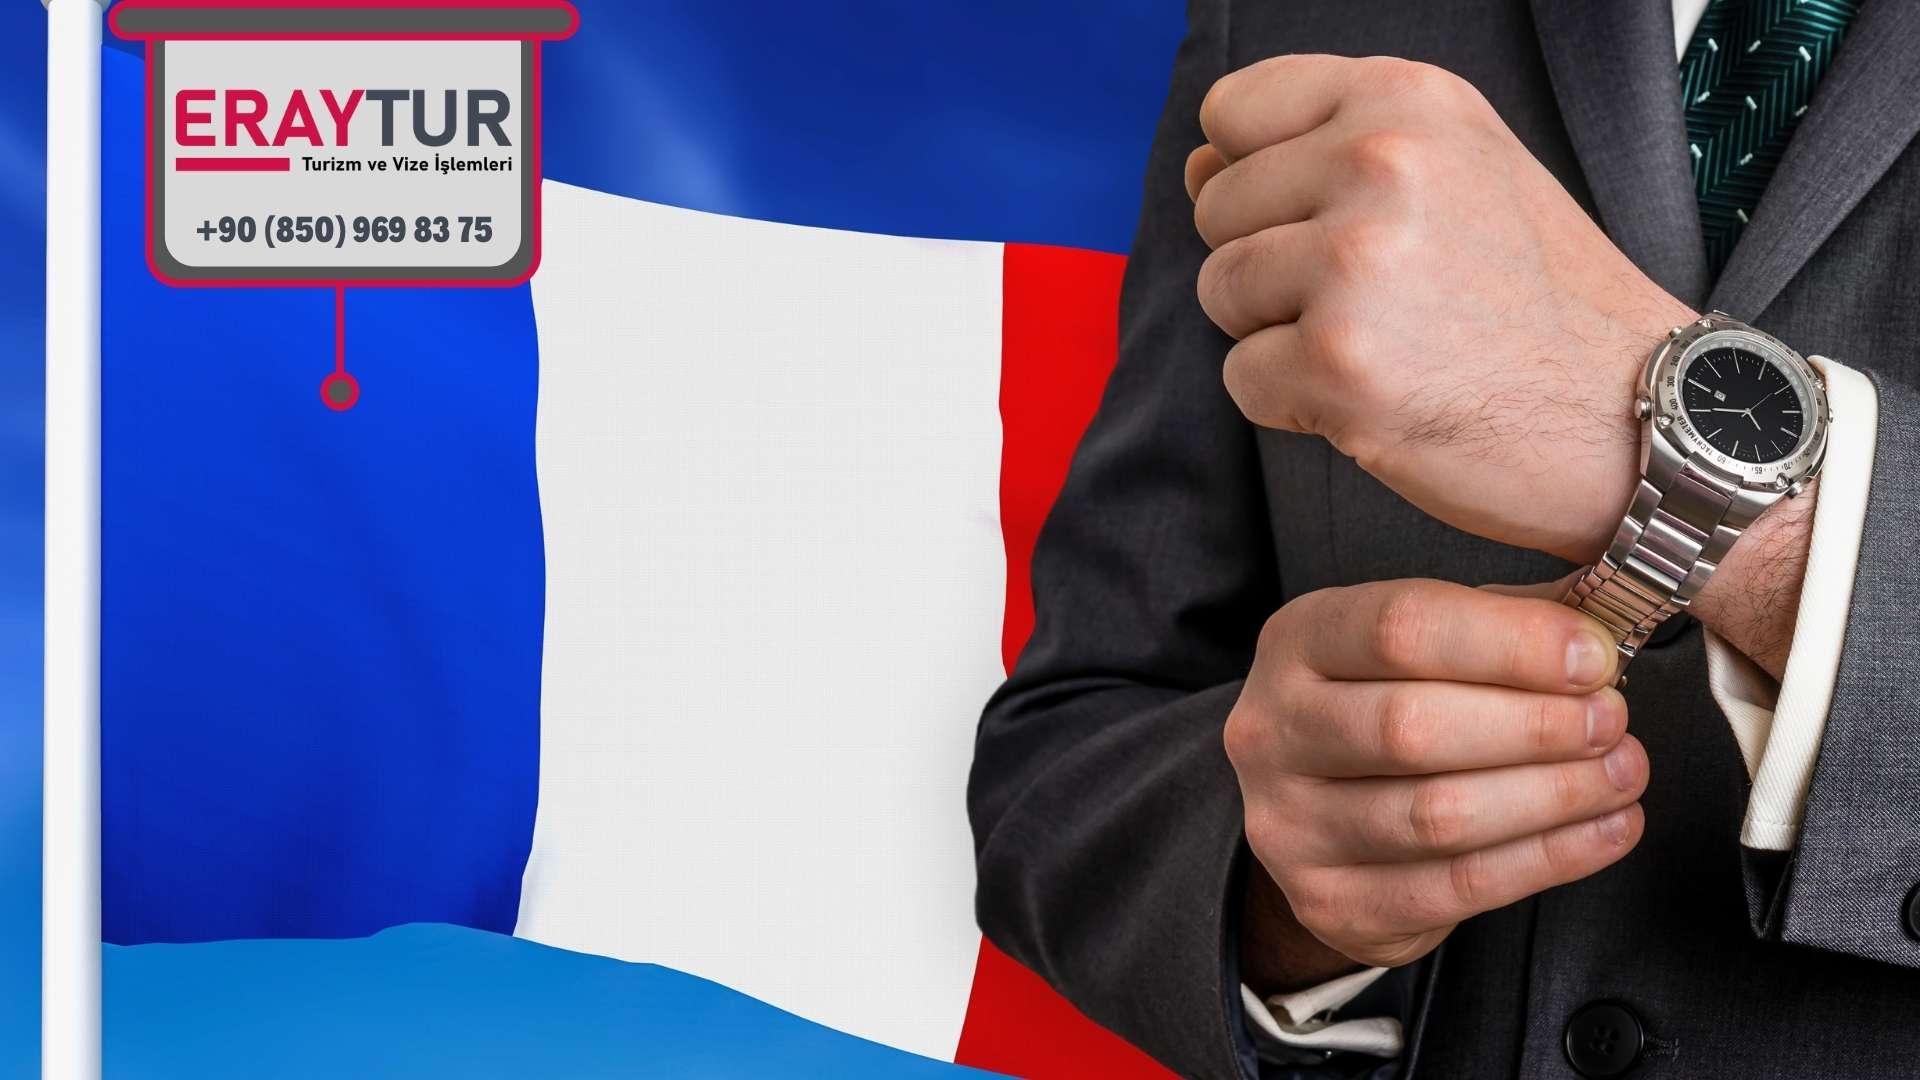 Fransa Ticari Vize Ücreti